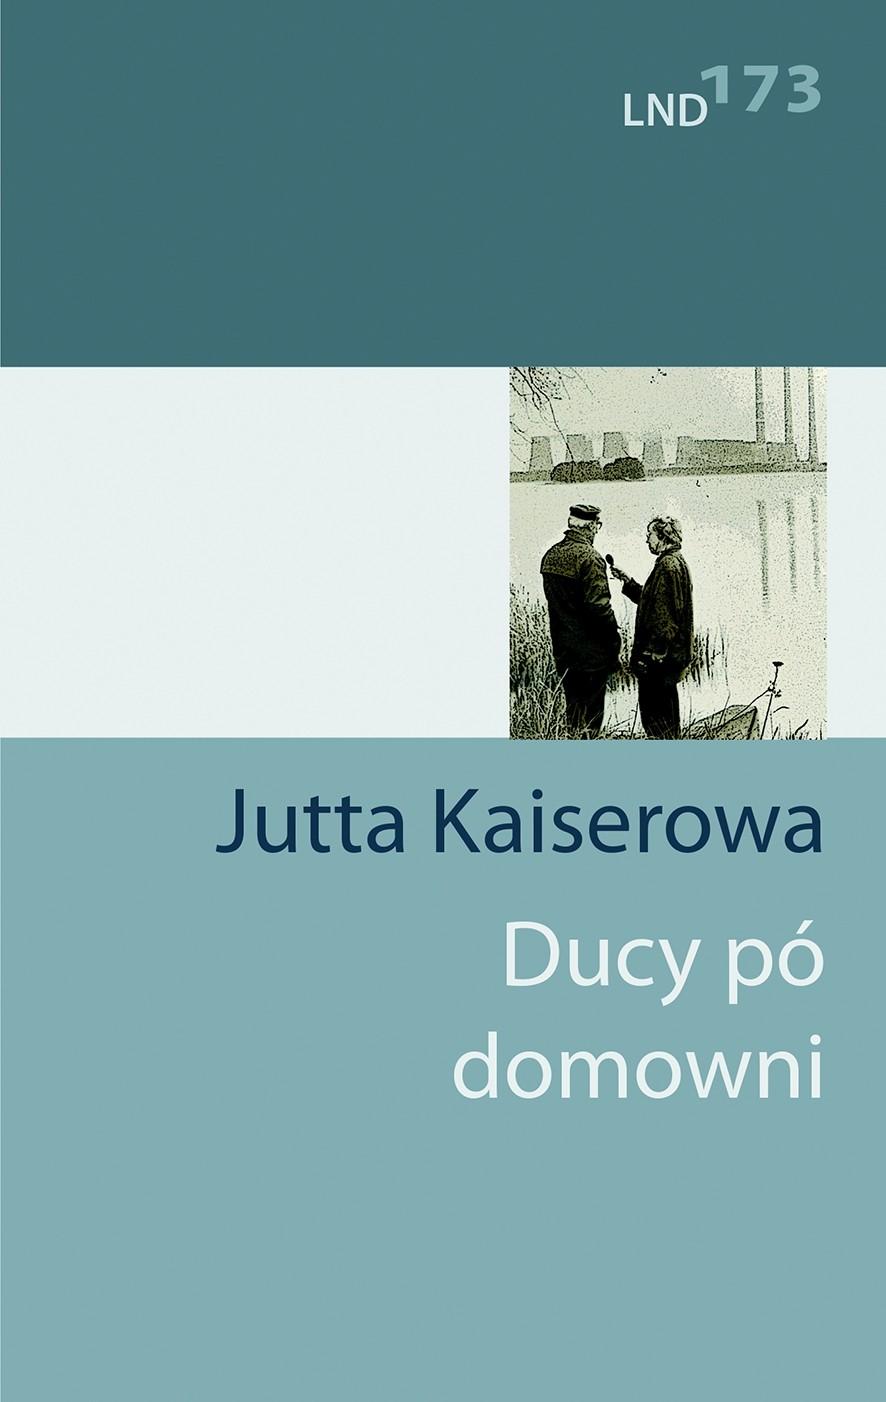 Ducy pó domowni• e-book